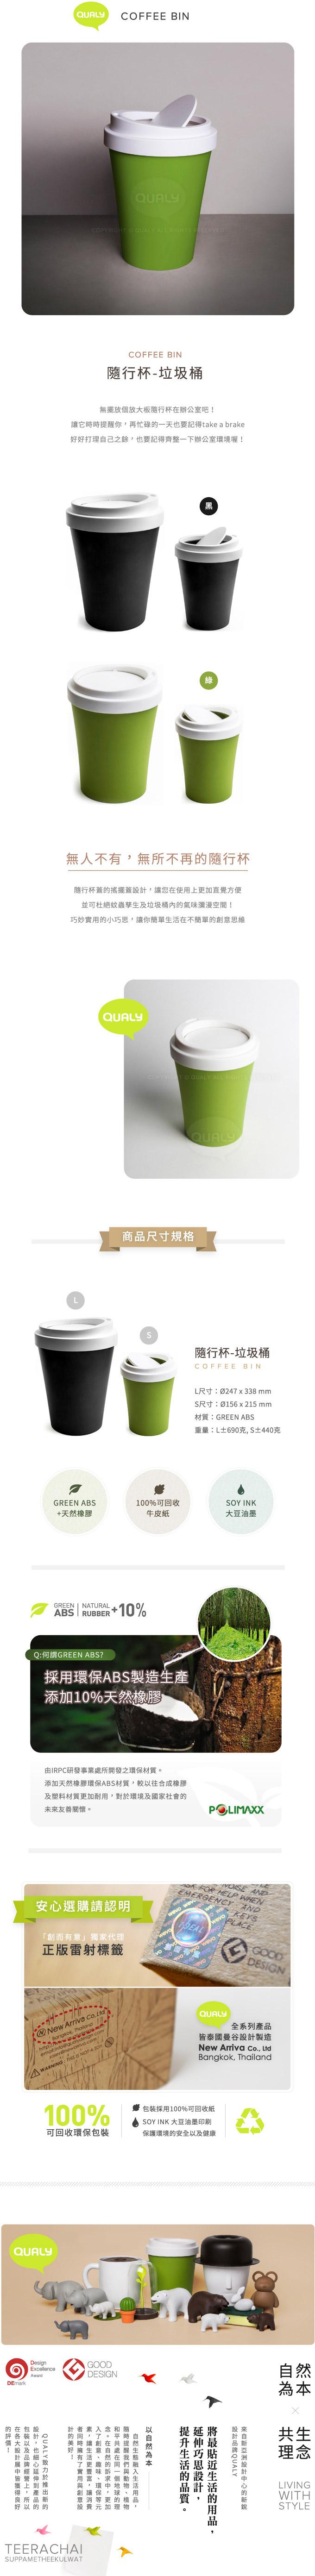 QUALY 隨行杯 垃圾桶 L 咖啡色